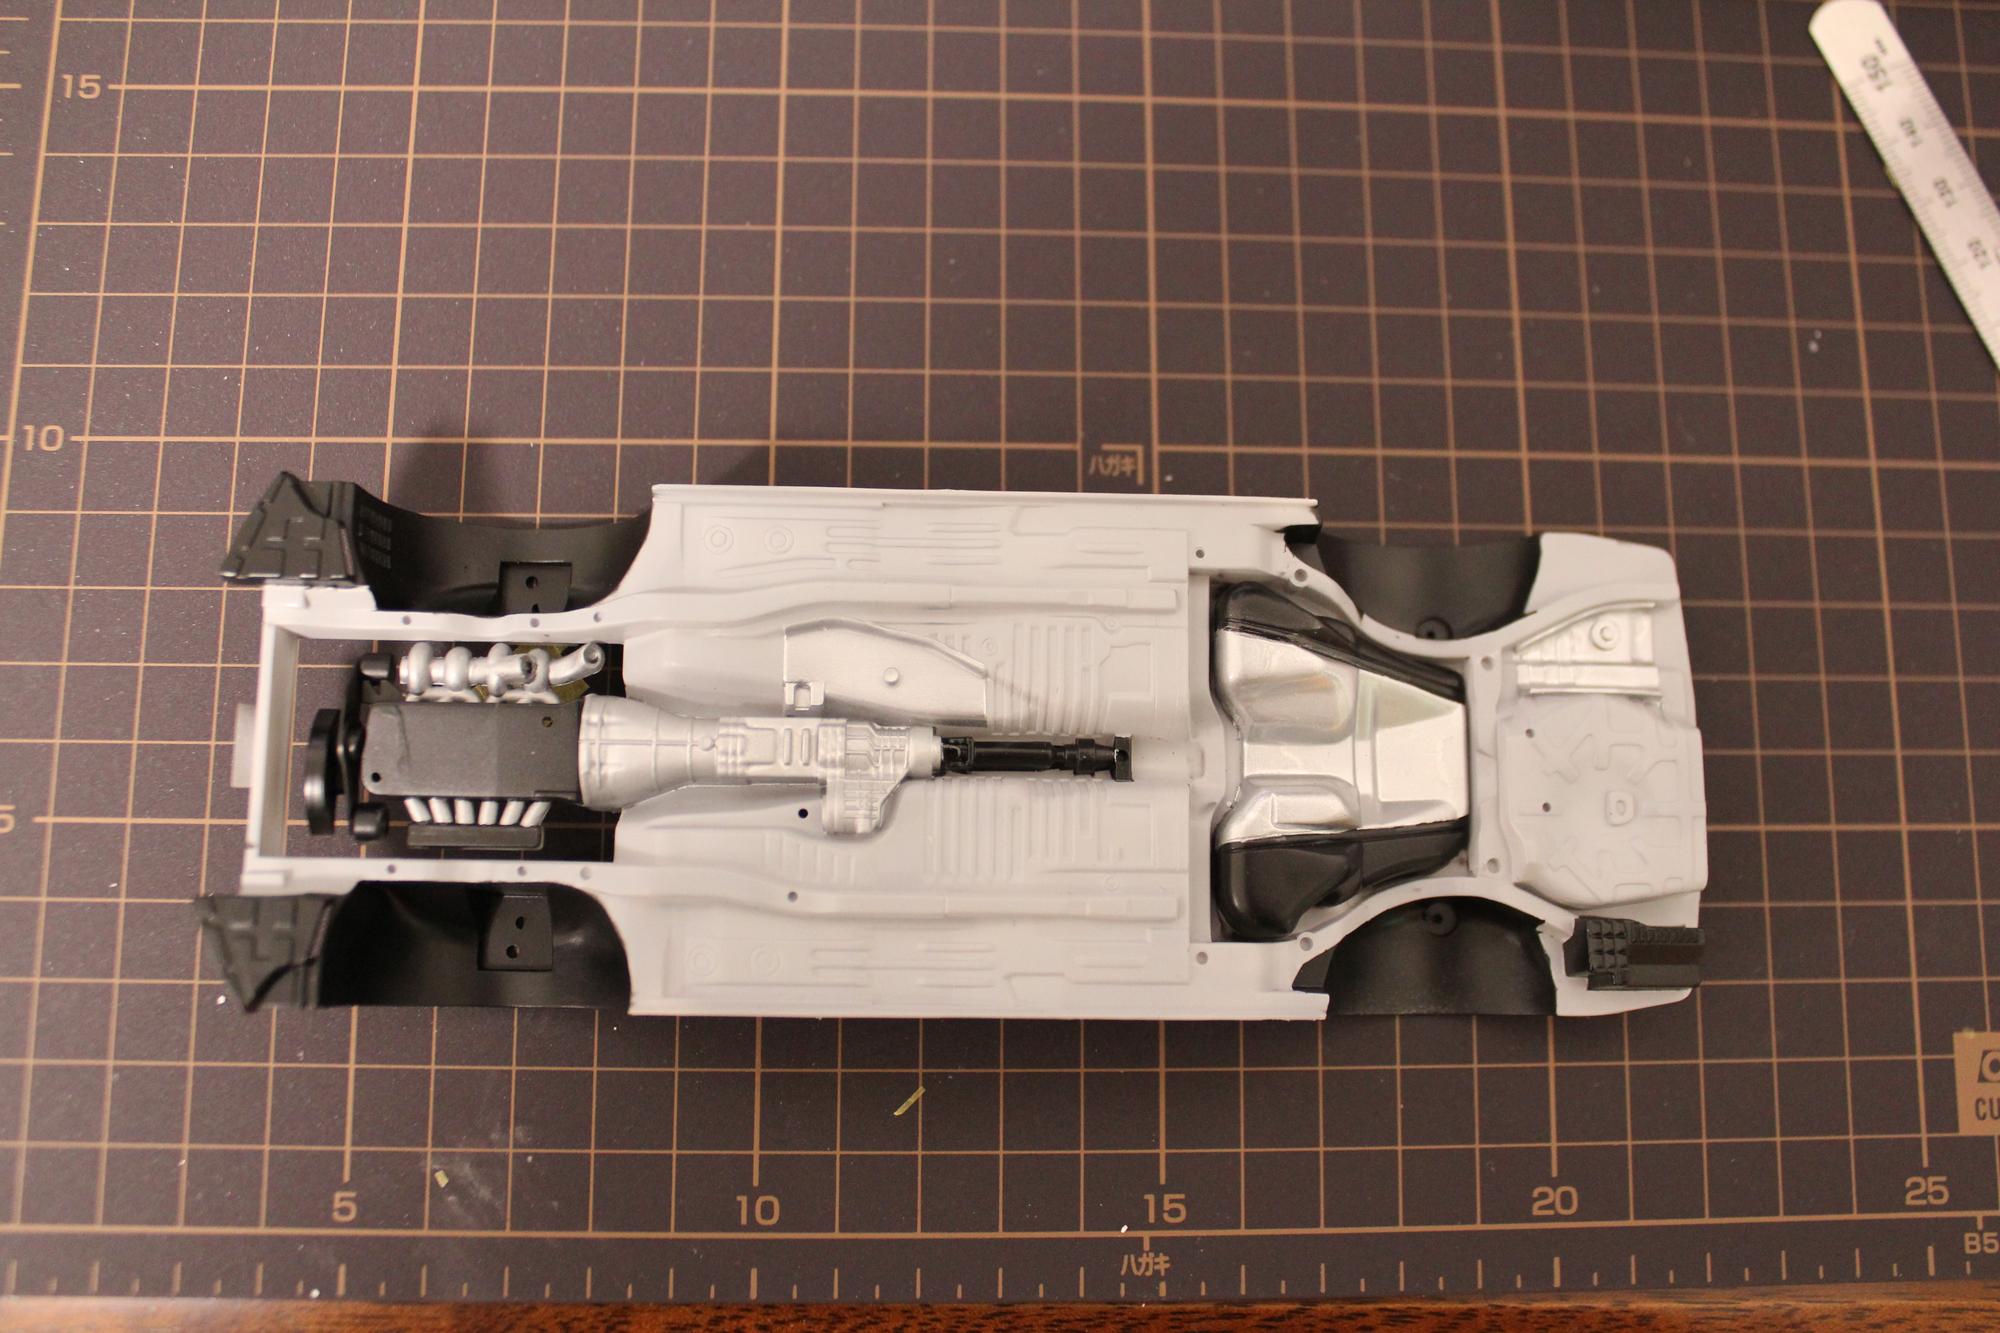 R33GT-Rシャーシ裏